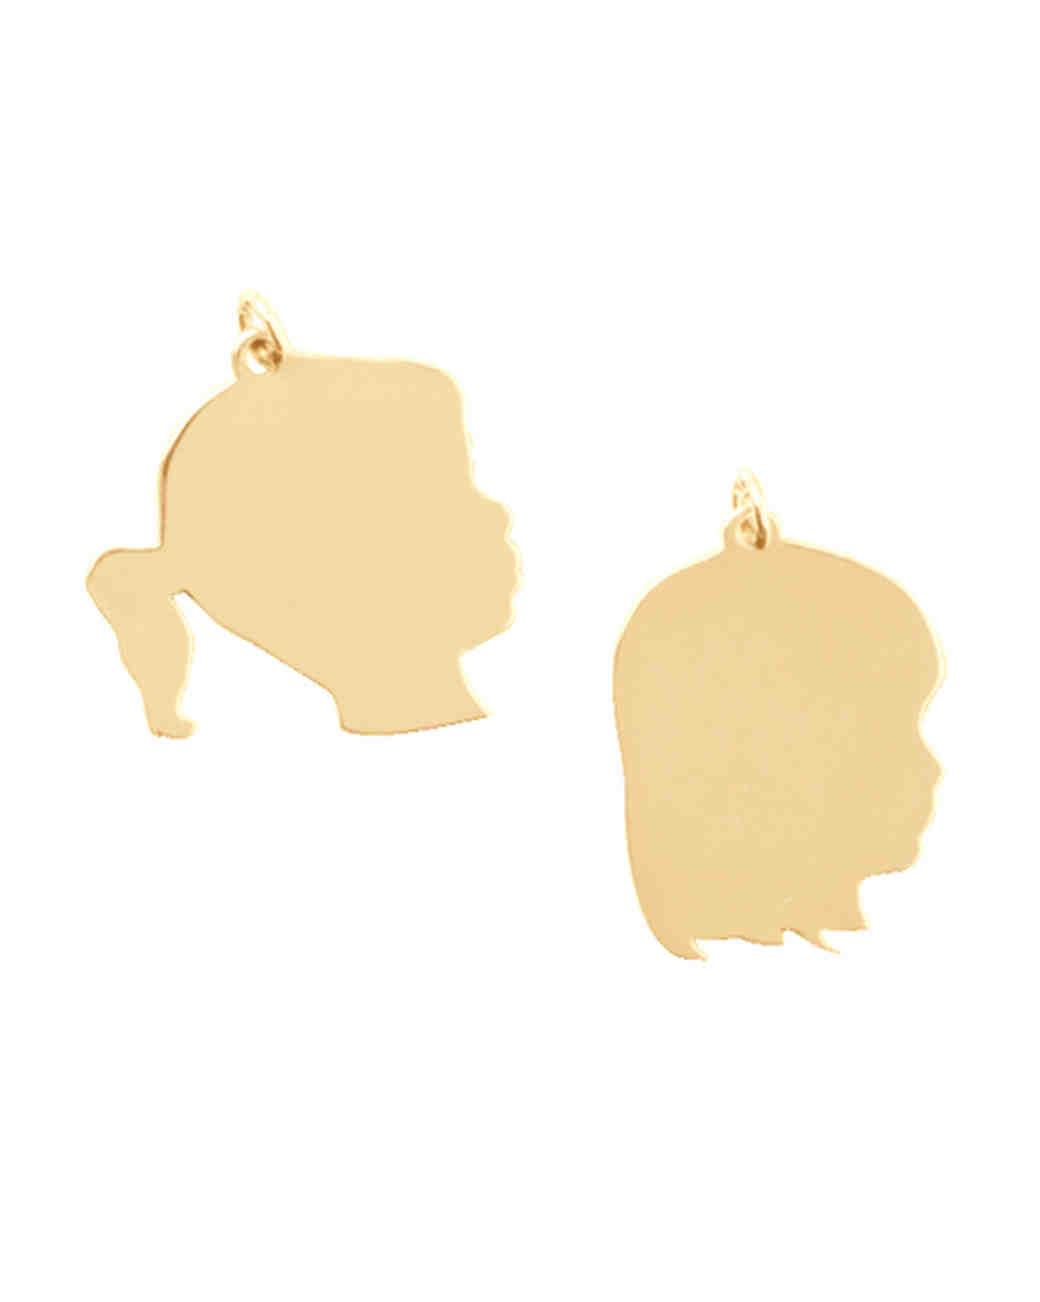 silhouette-necklace-007-d112465.jpg